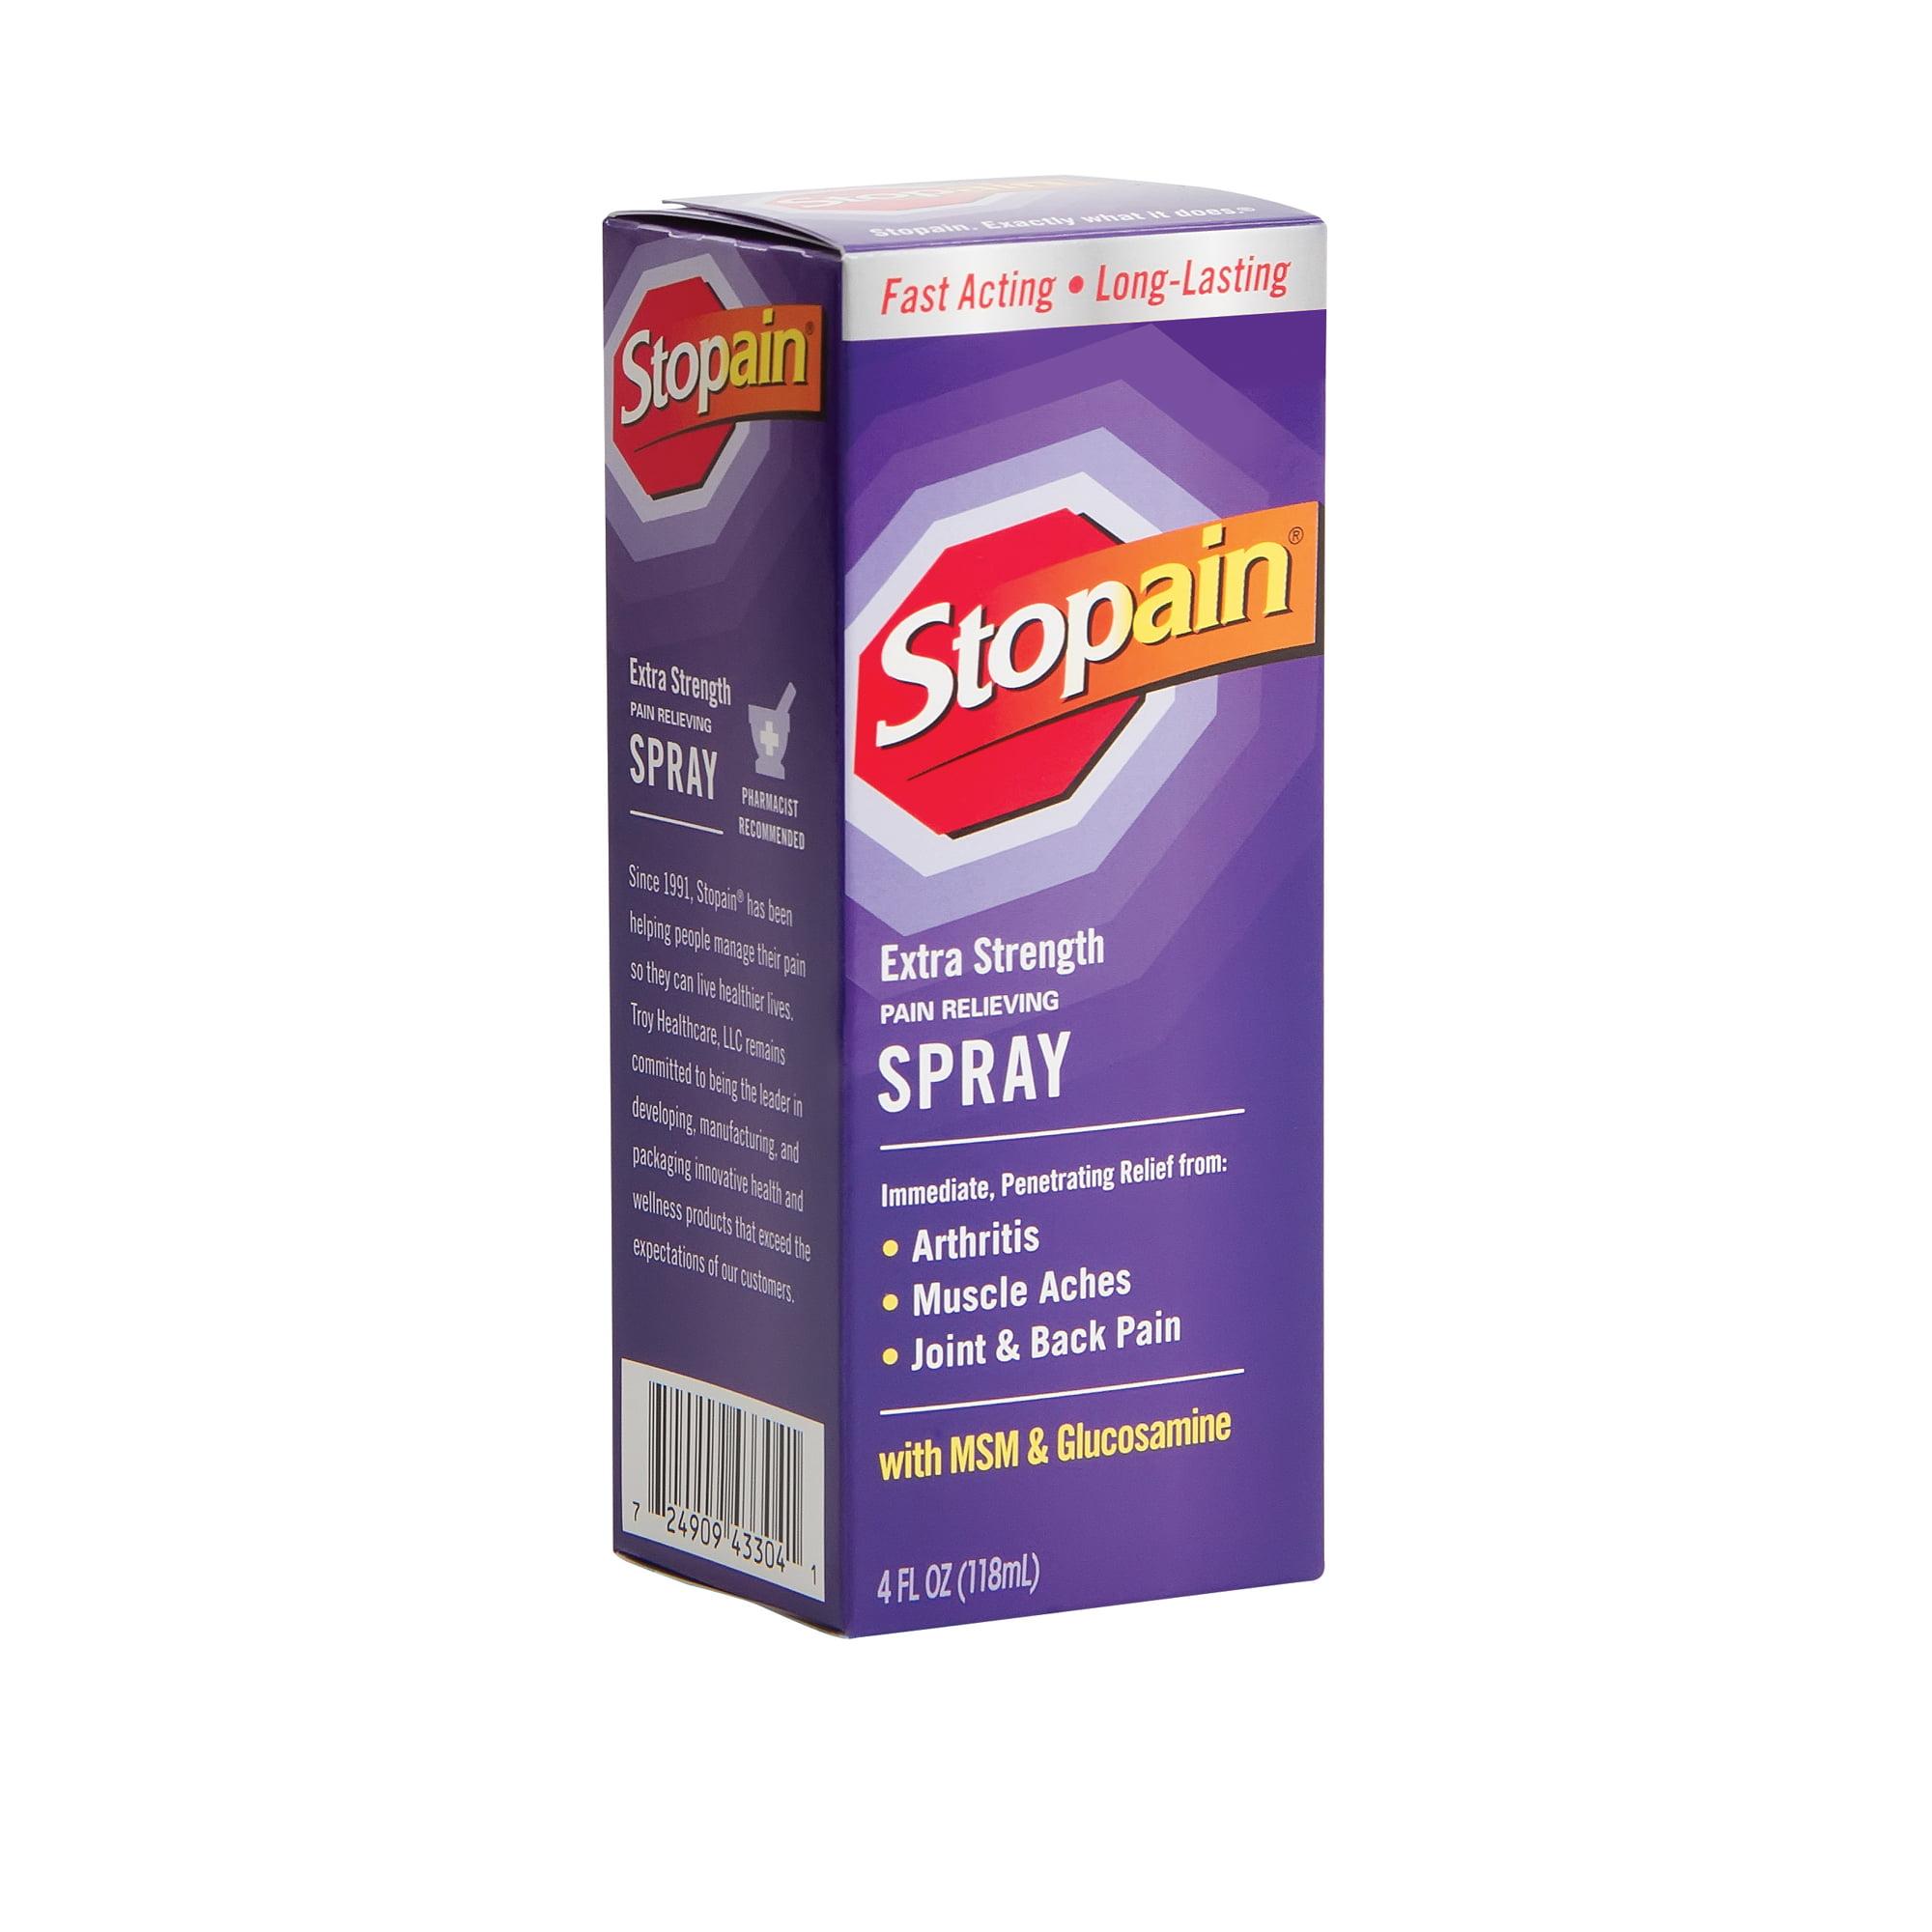 Stopain Pain Relief Extra Strength Spray 4 Fl Oz